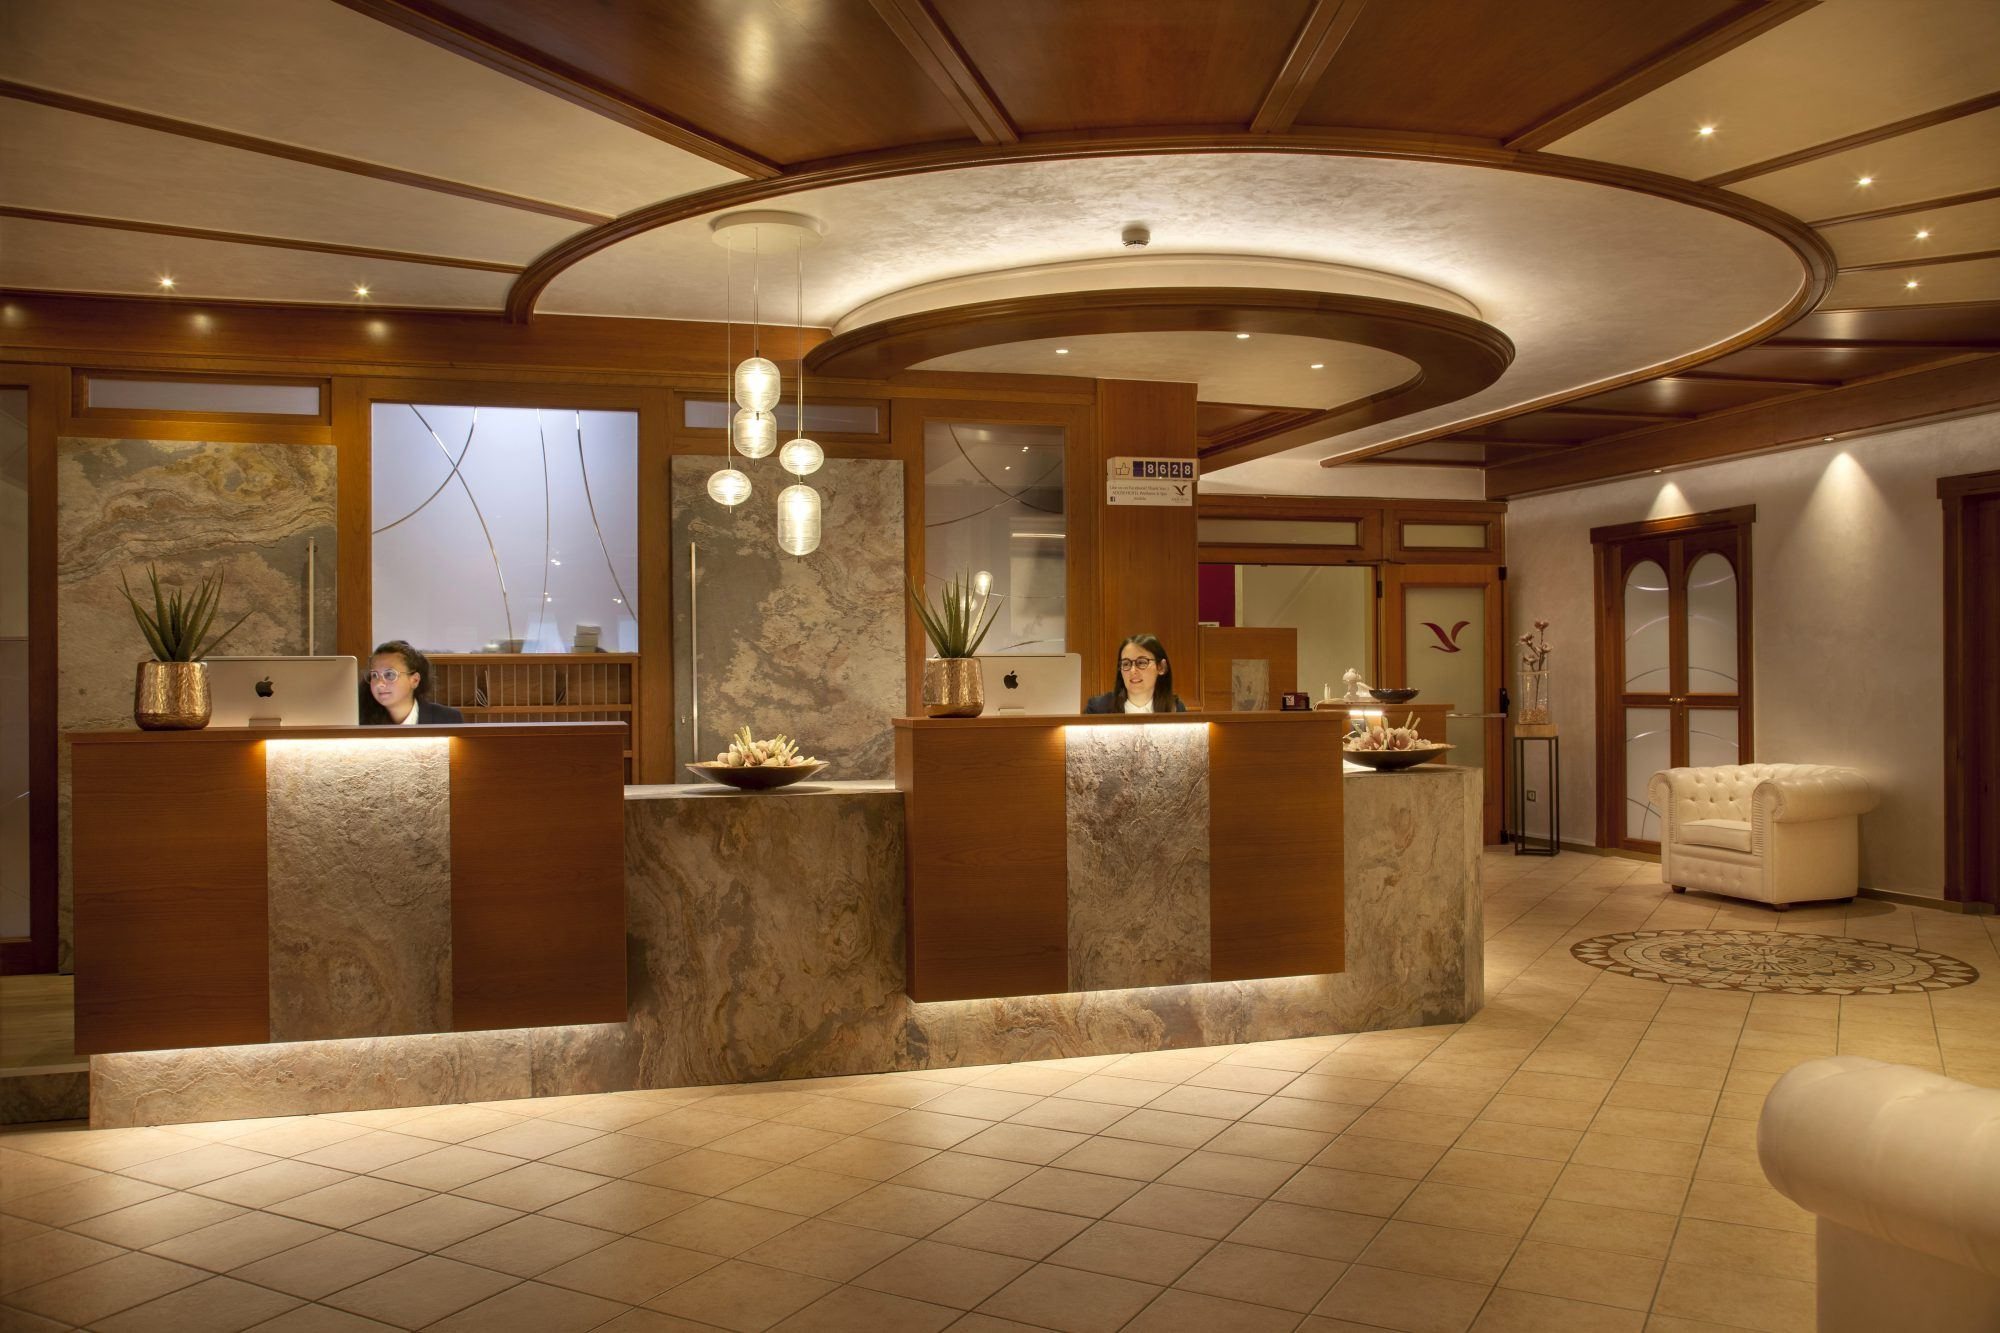 3 - Reception & Hall